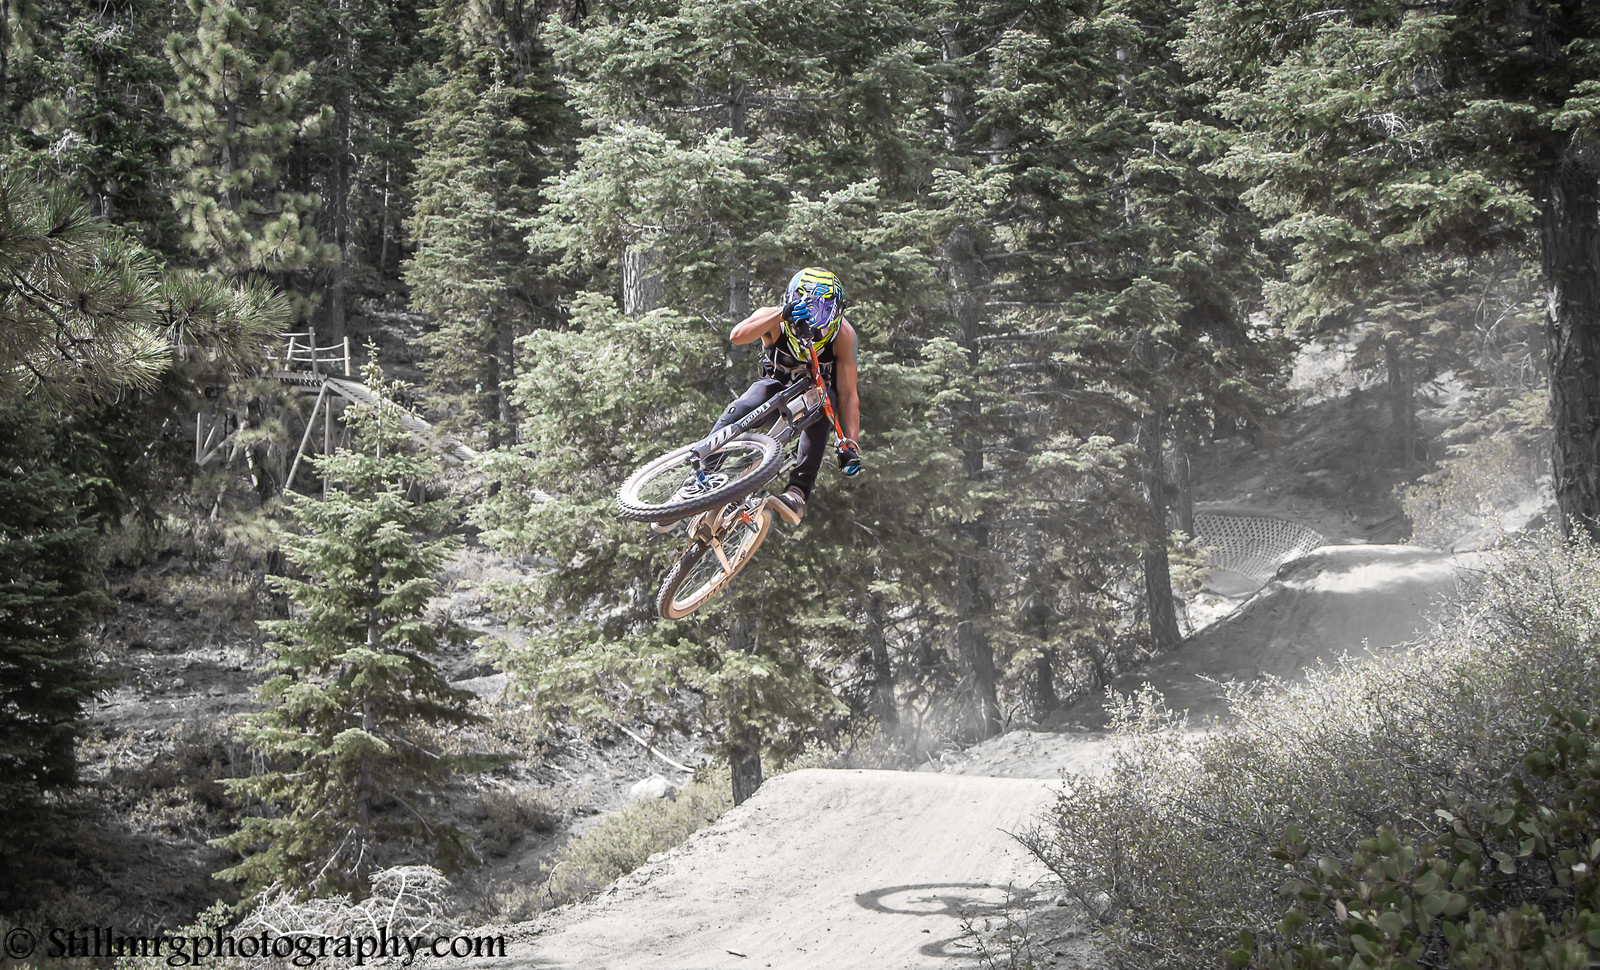 Samuel Mercado - Stillmrg Photography - Mountain Biking Pictures - Vital MTB